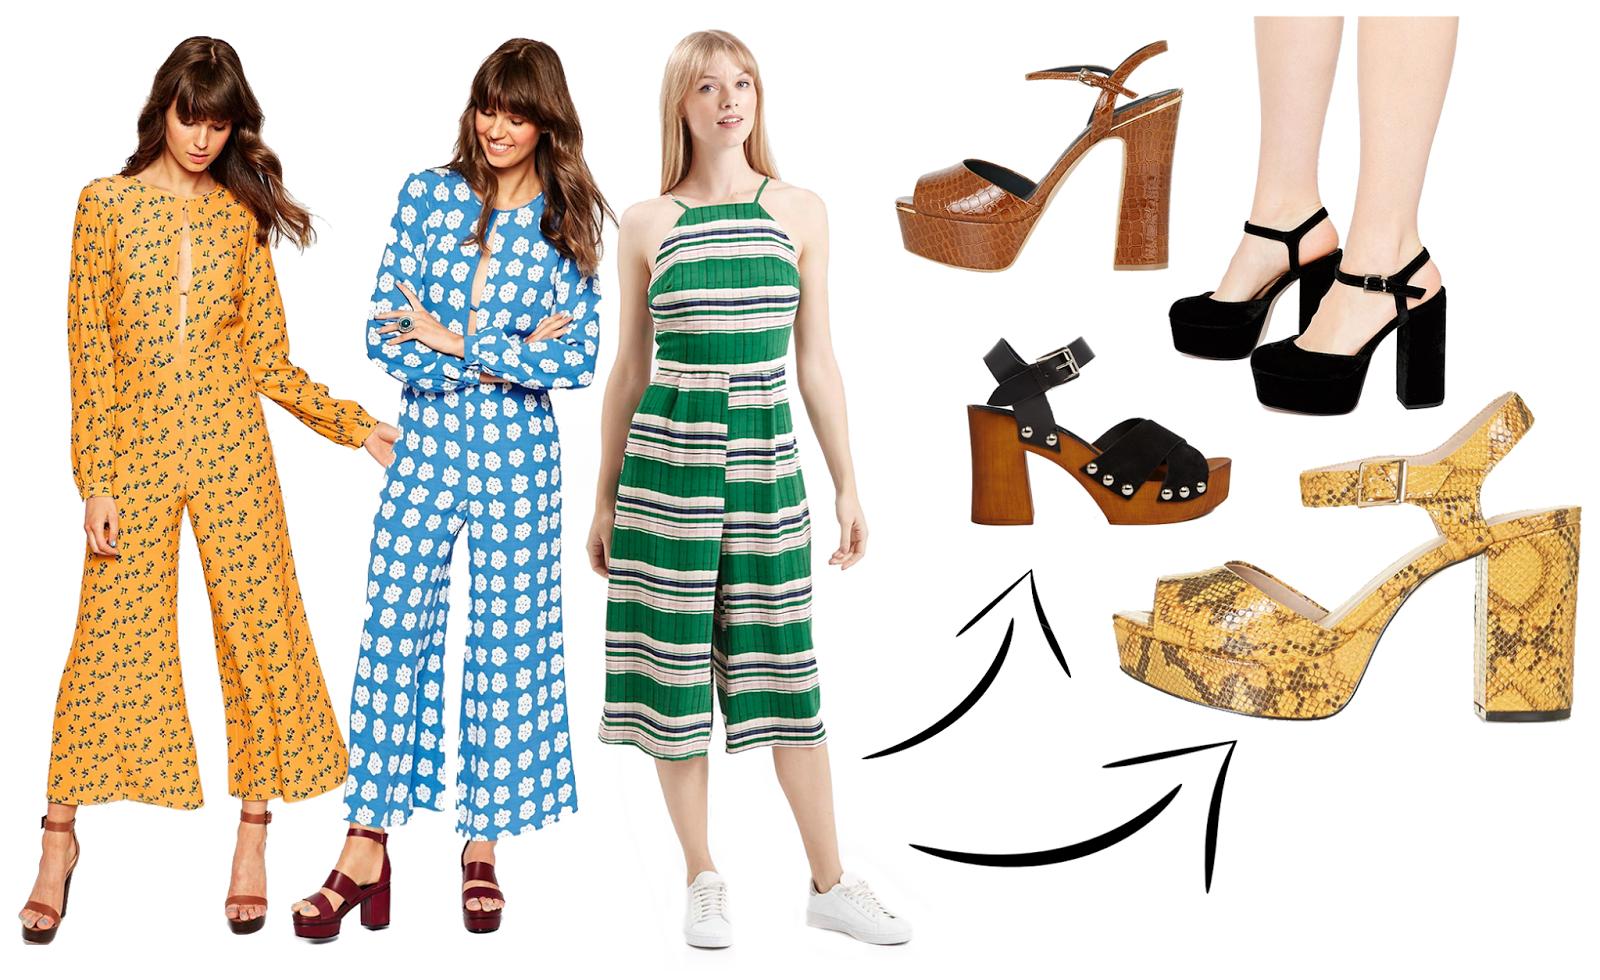 lfw london fashion week outfit ideas